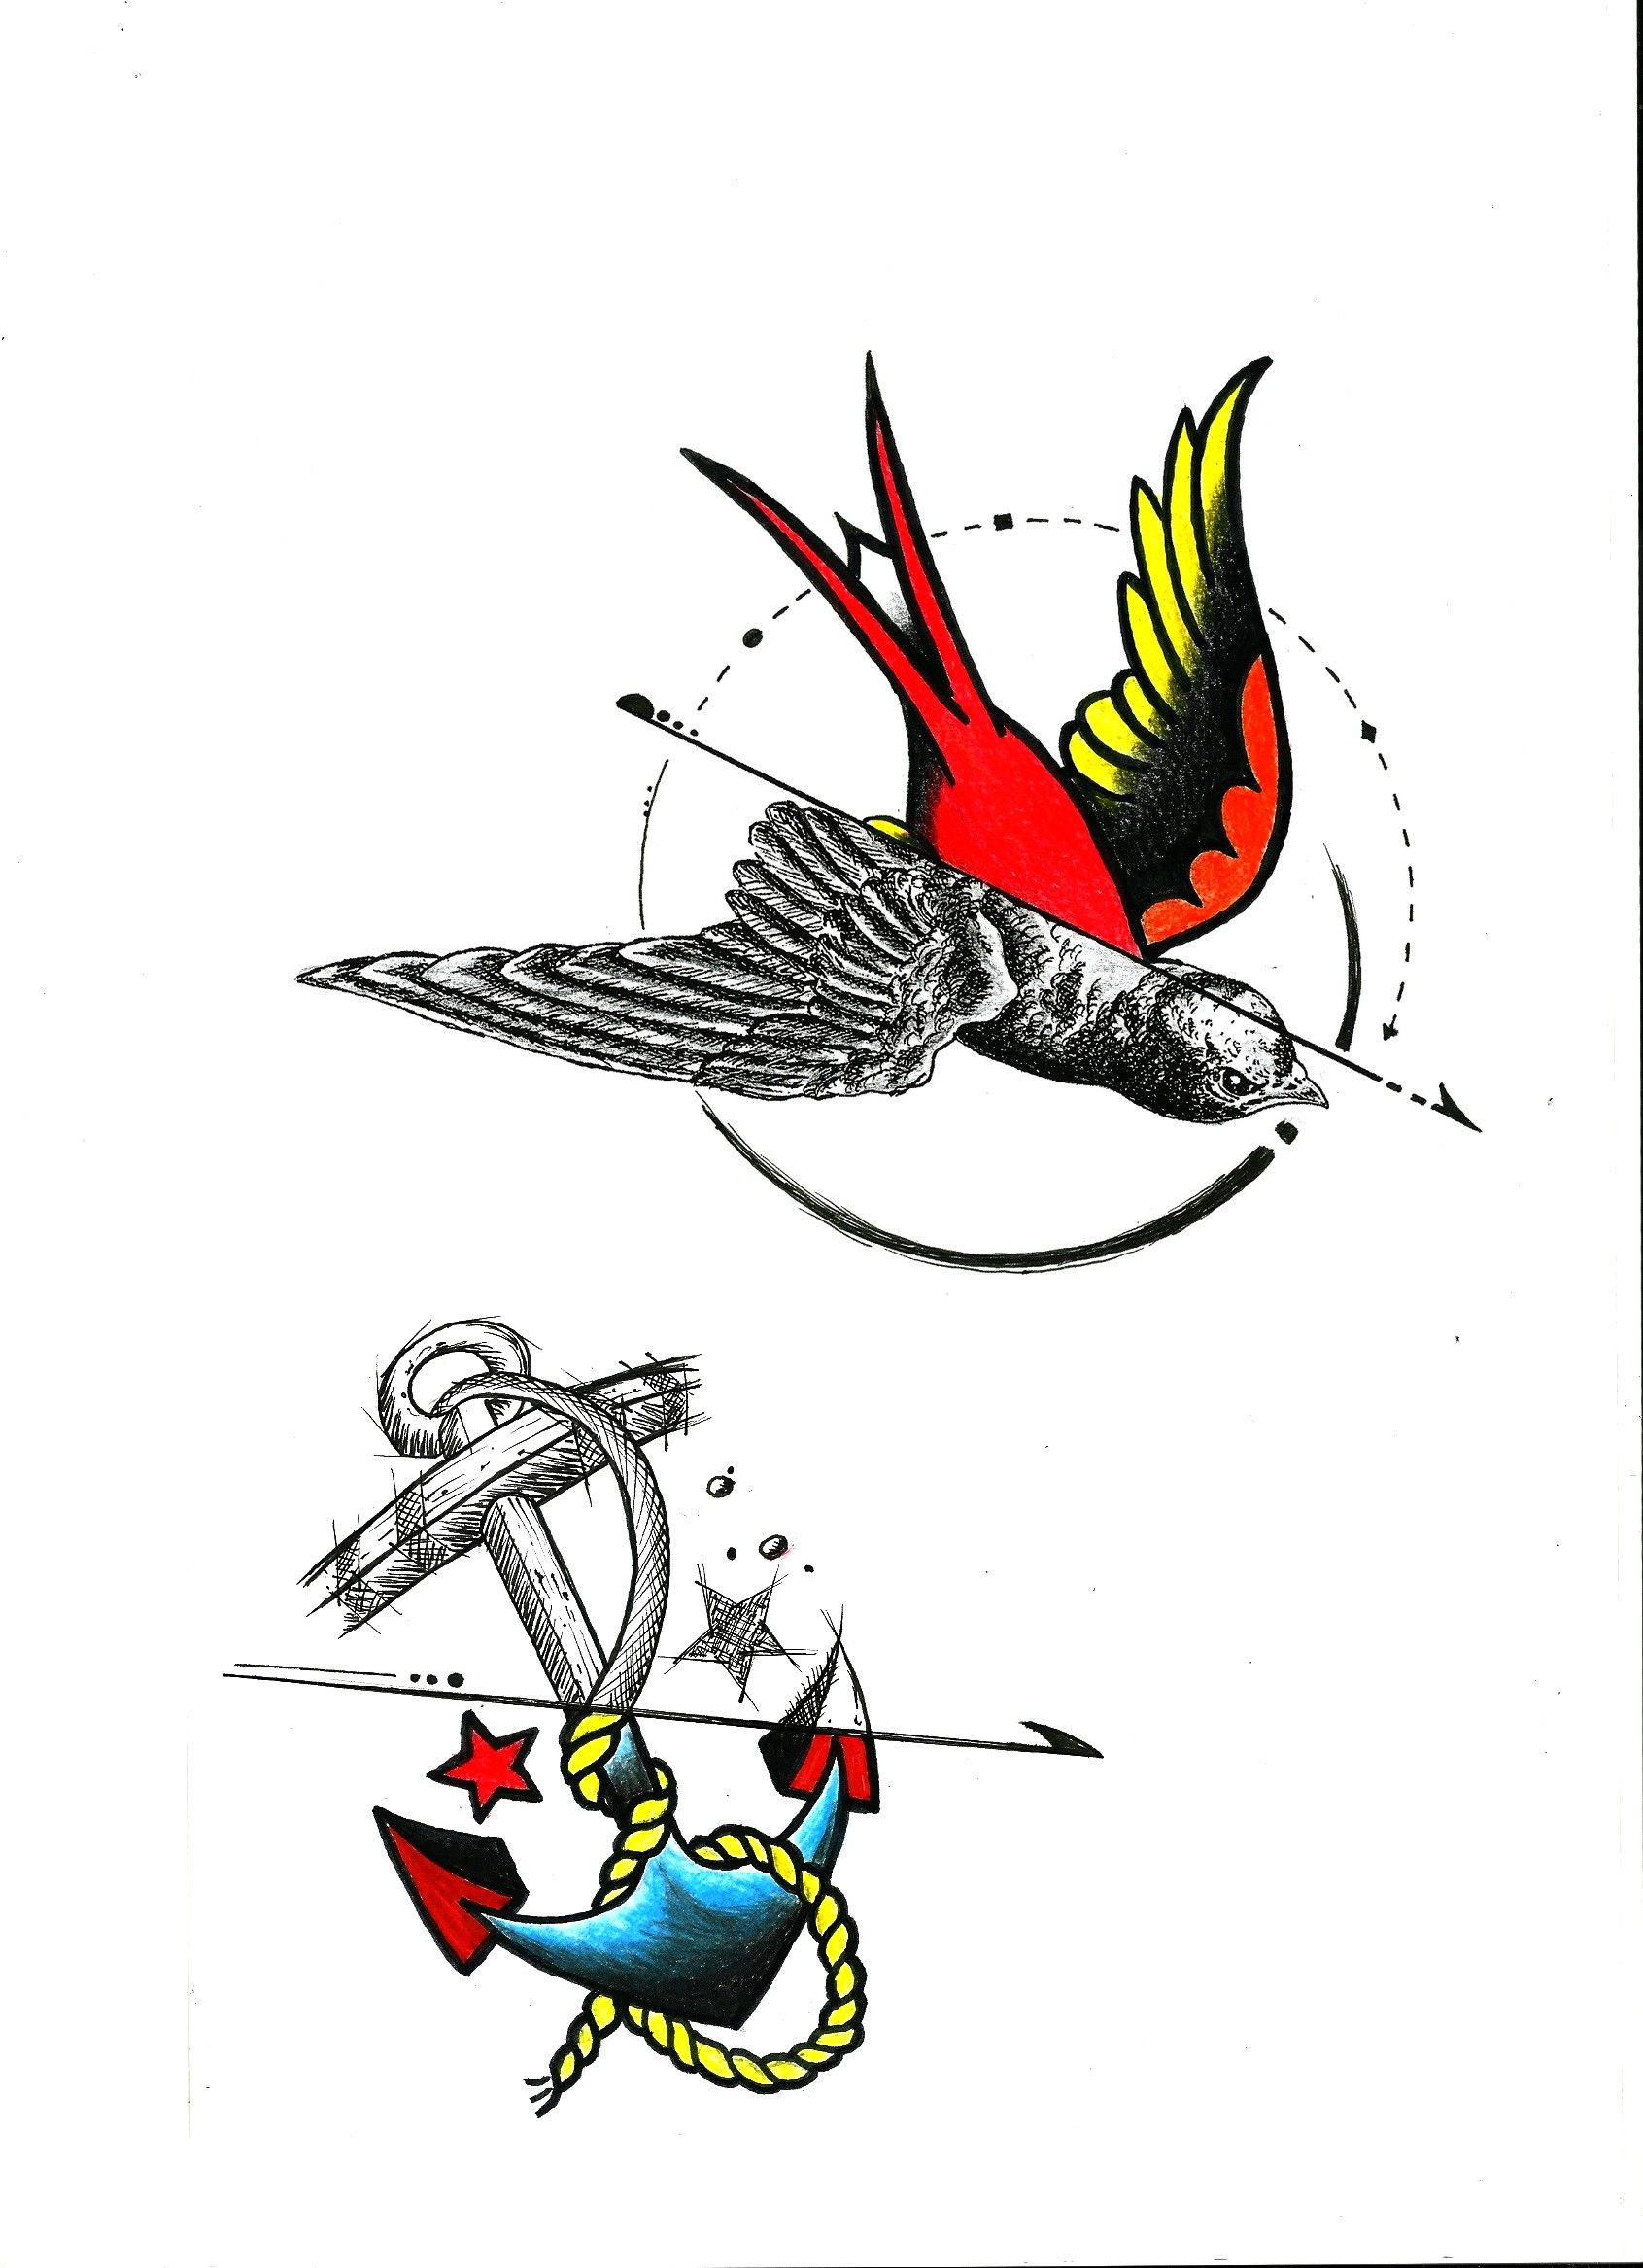 Custom Sketch, Tattoo, Anchor, Black and White Art